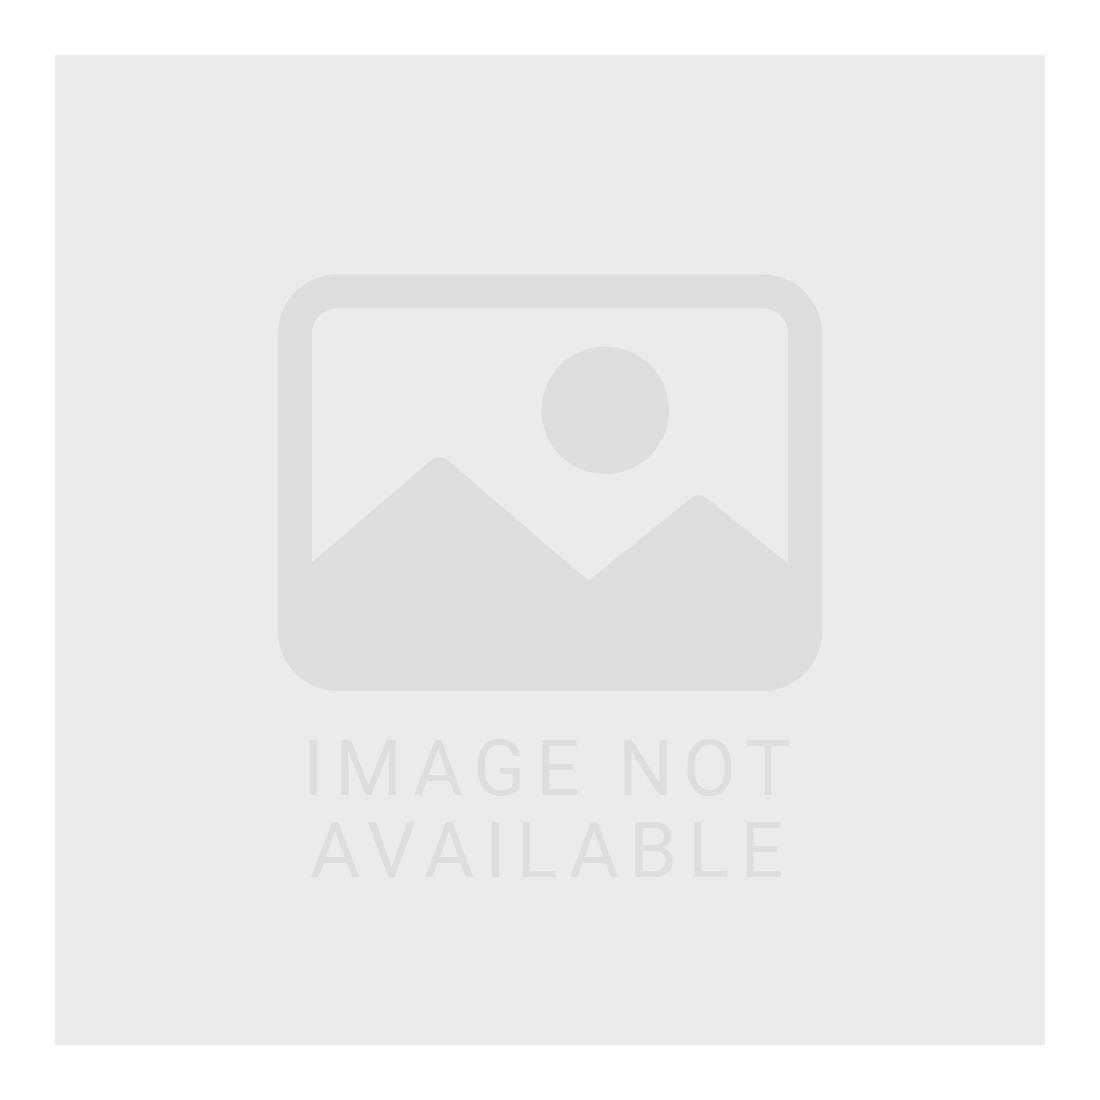 $100 Ram Trucks Outfitter Gift Card